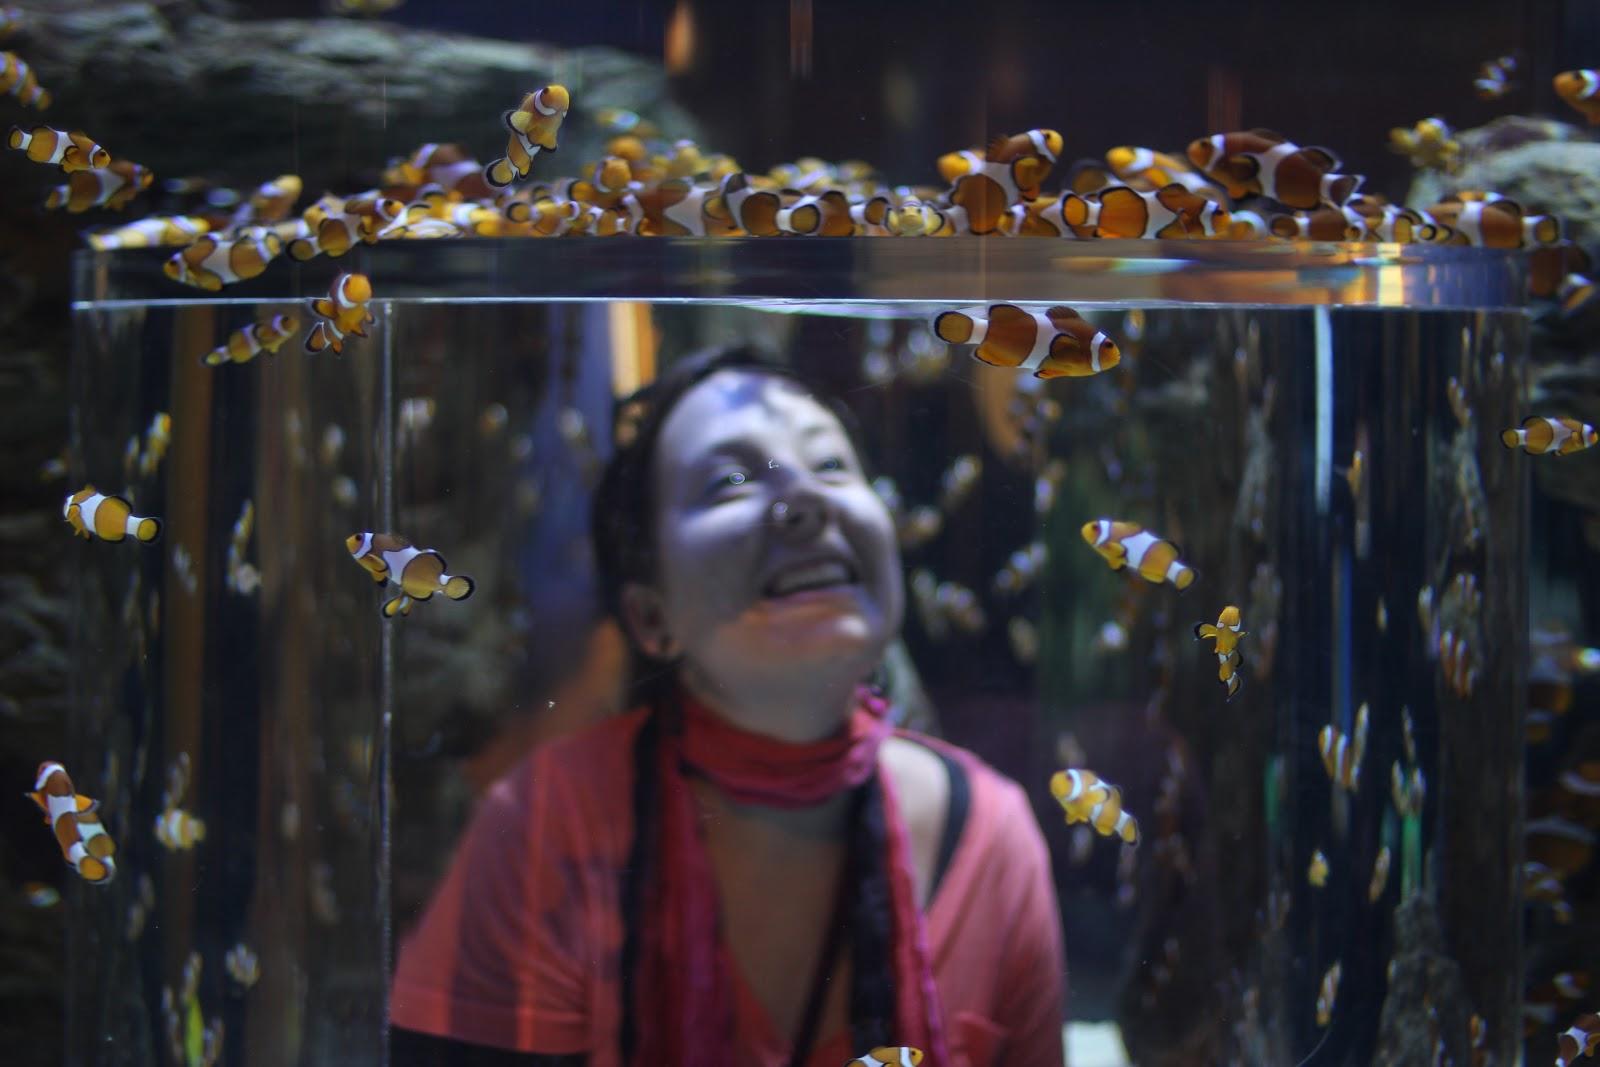 Freshwater aquarium fish cape town - Jordan In Middle Of Clown Fish At The Aquarium Cape Town